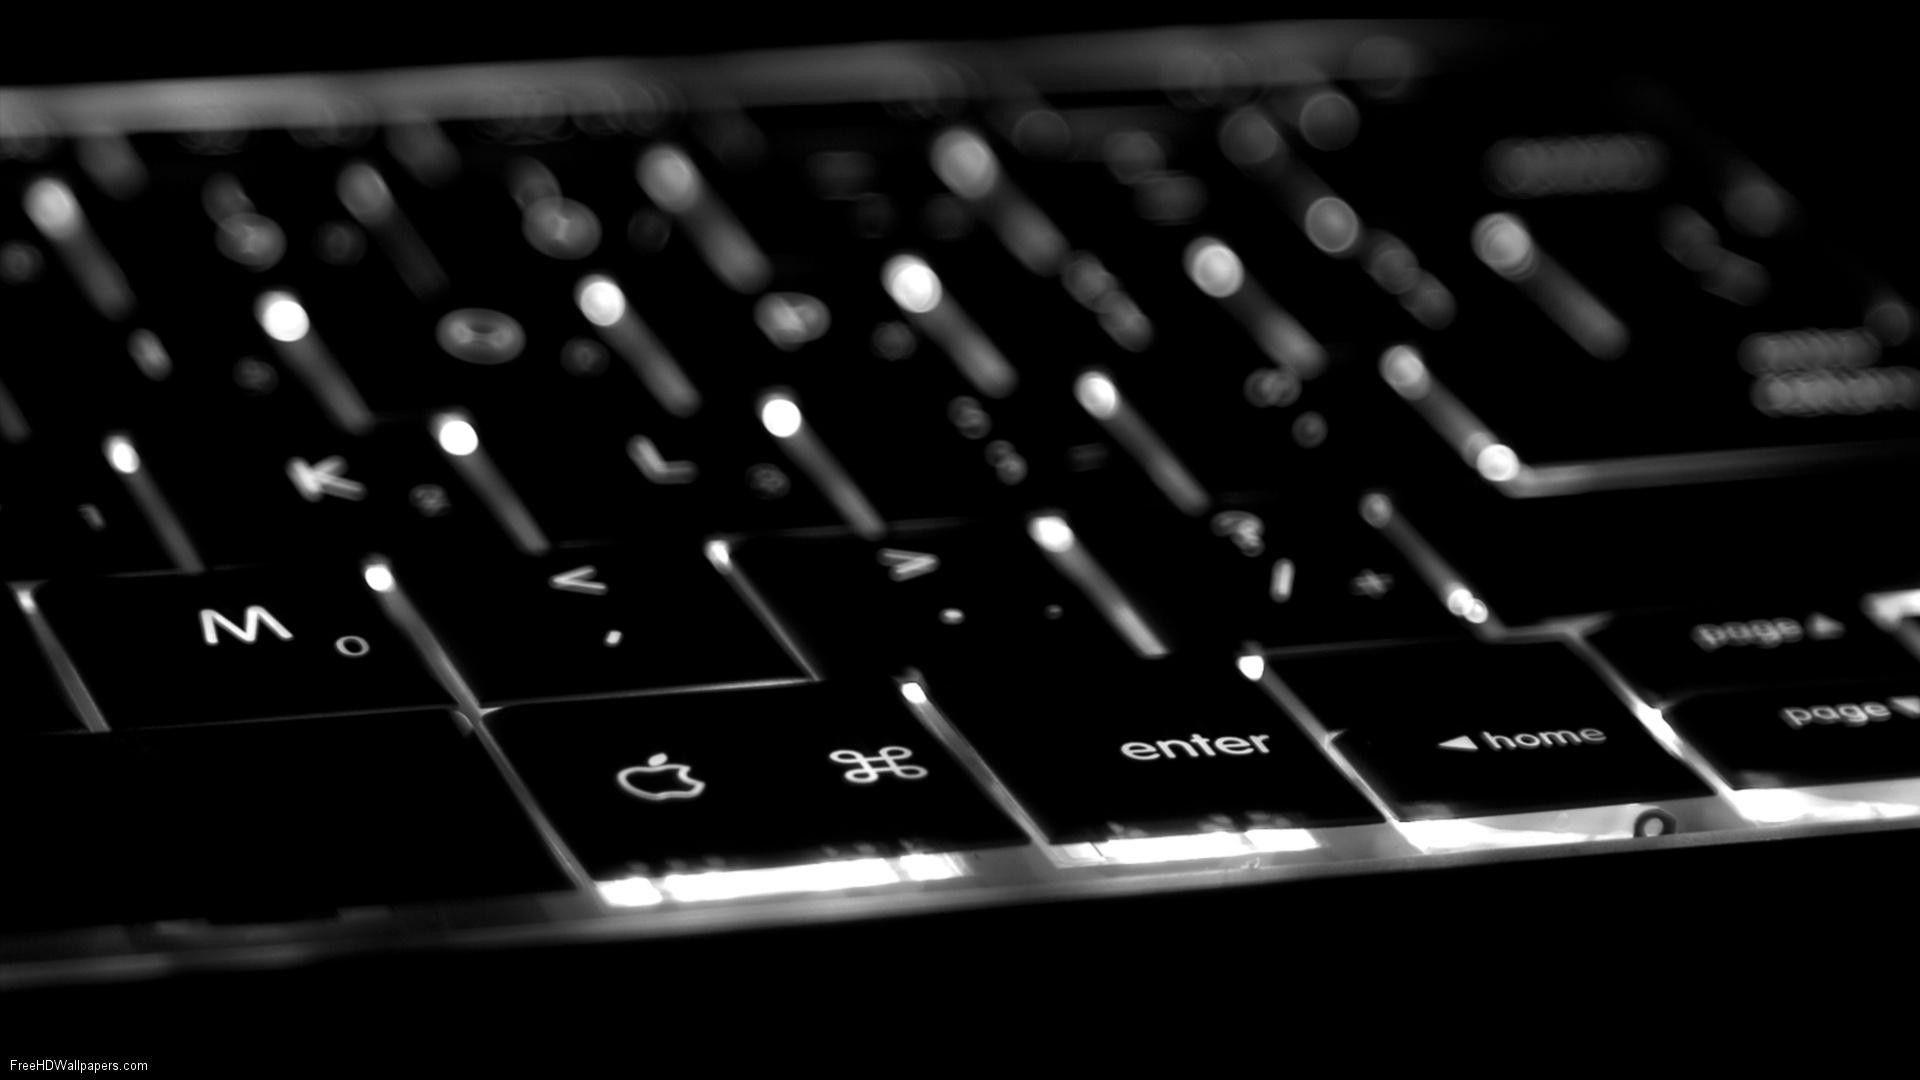 computer keyboard pics hd